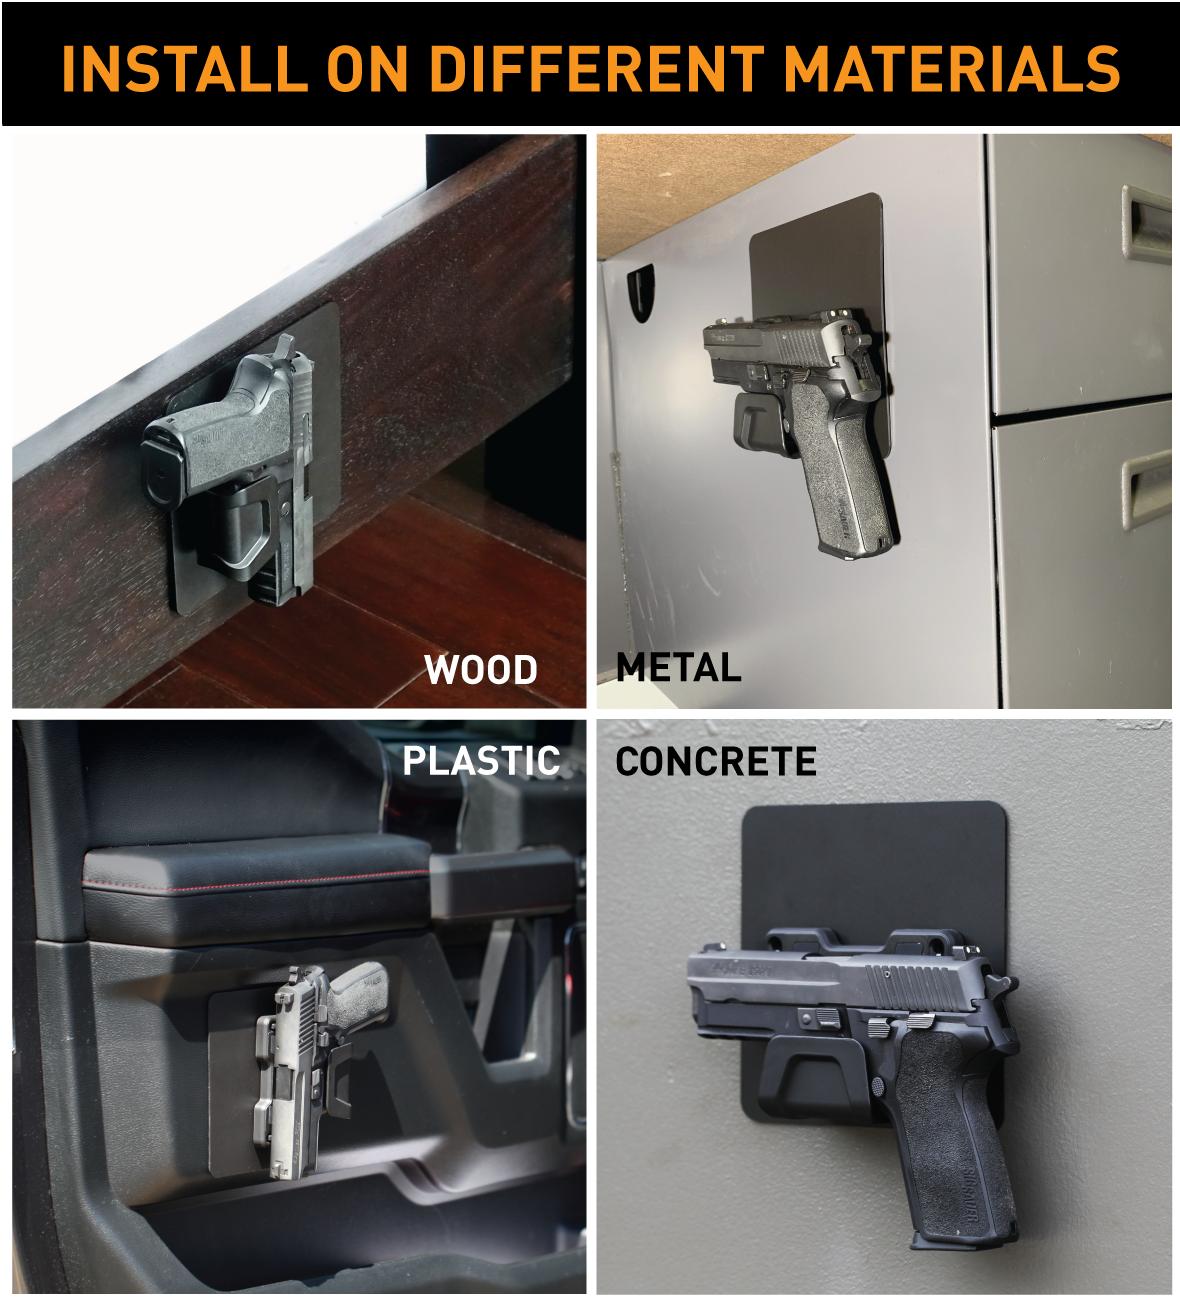 Stinger Magnetic Gun Mount with Safety Trigger Guard Protection, Wall Mounted Gun Rack, Firearm Concealed Holder for Handgun Rifle Shotgun Pistol Revolver, Car Storage, Desk Gun Holster (2 Pack)